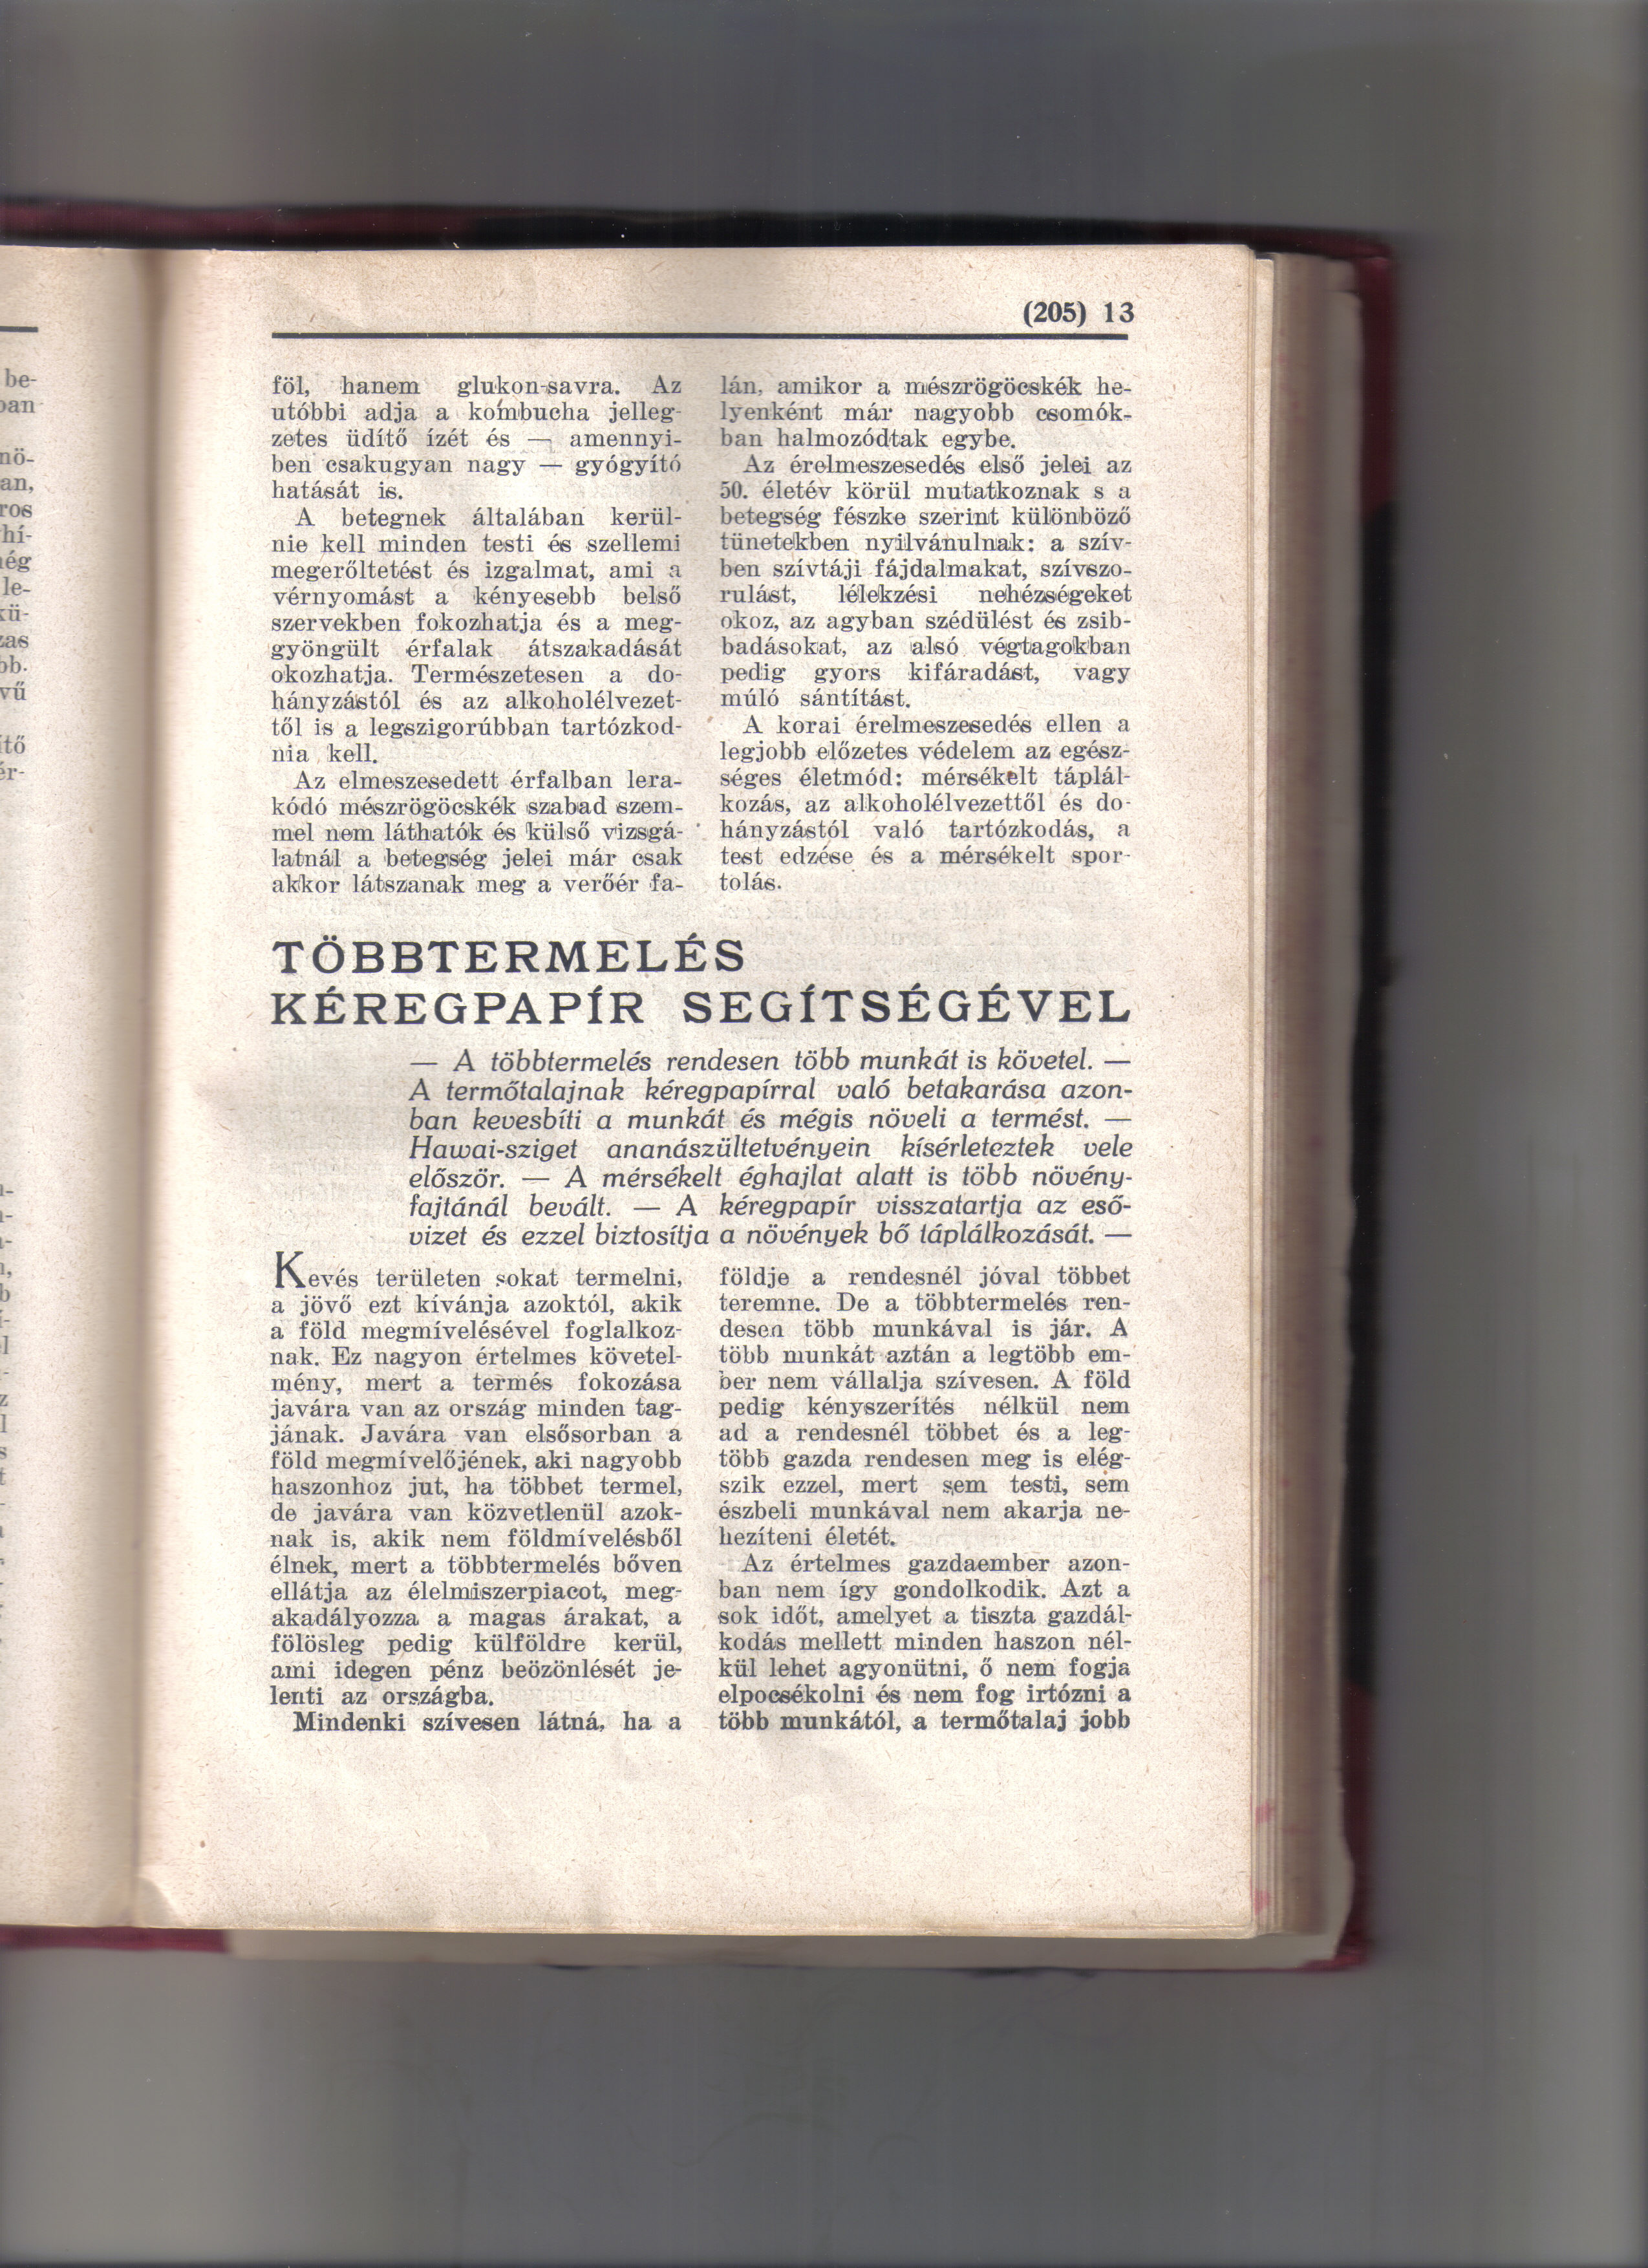 papir1.jpg